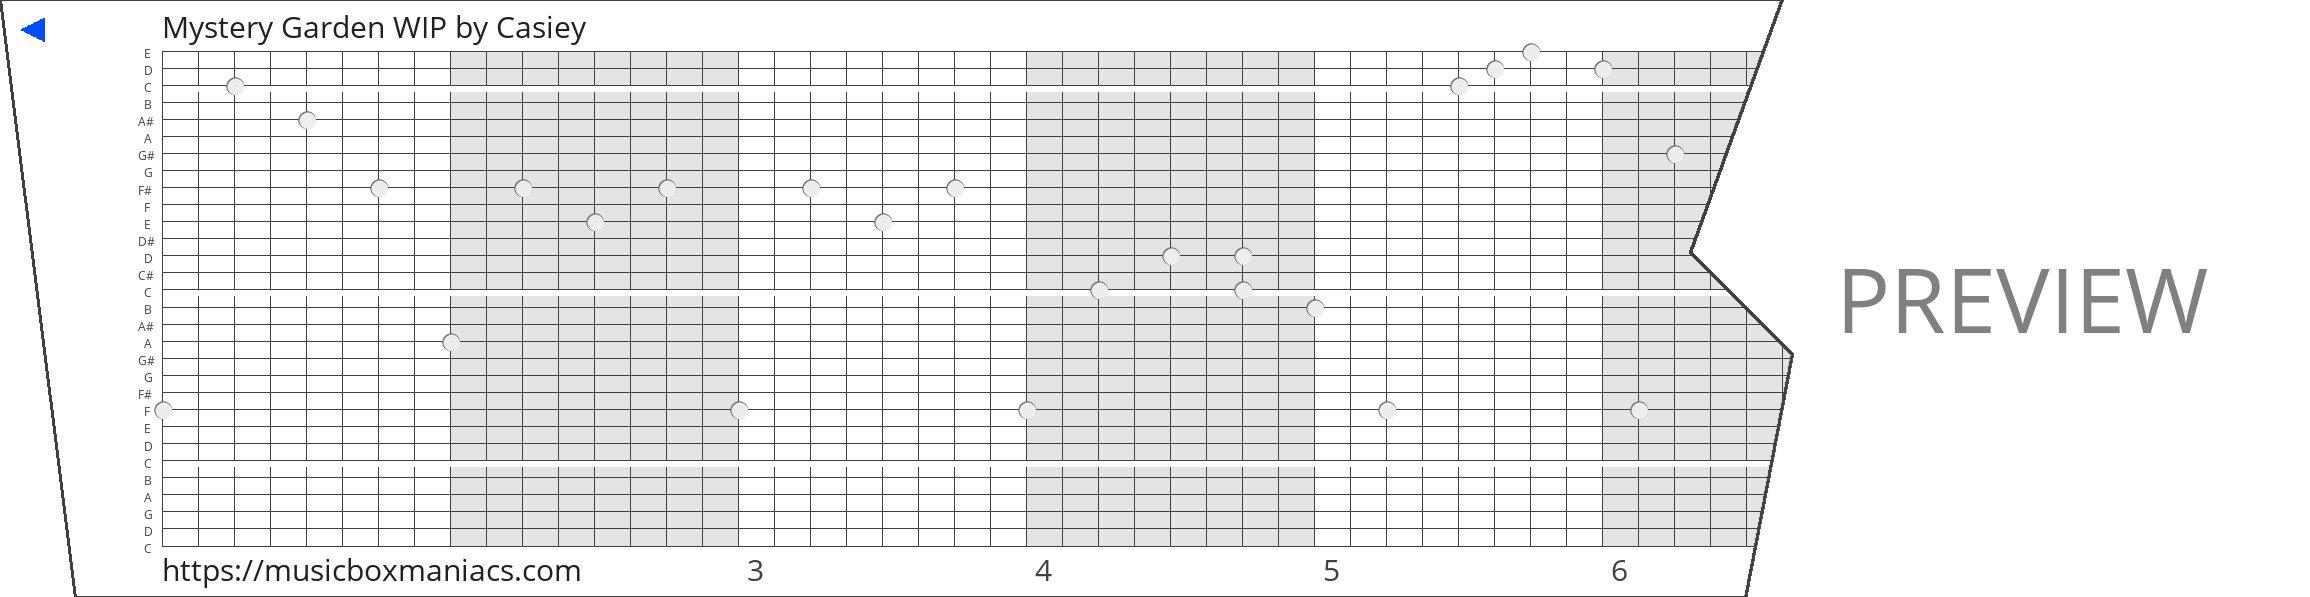 Mystery Garden WIP 30 note music box paper strip